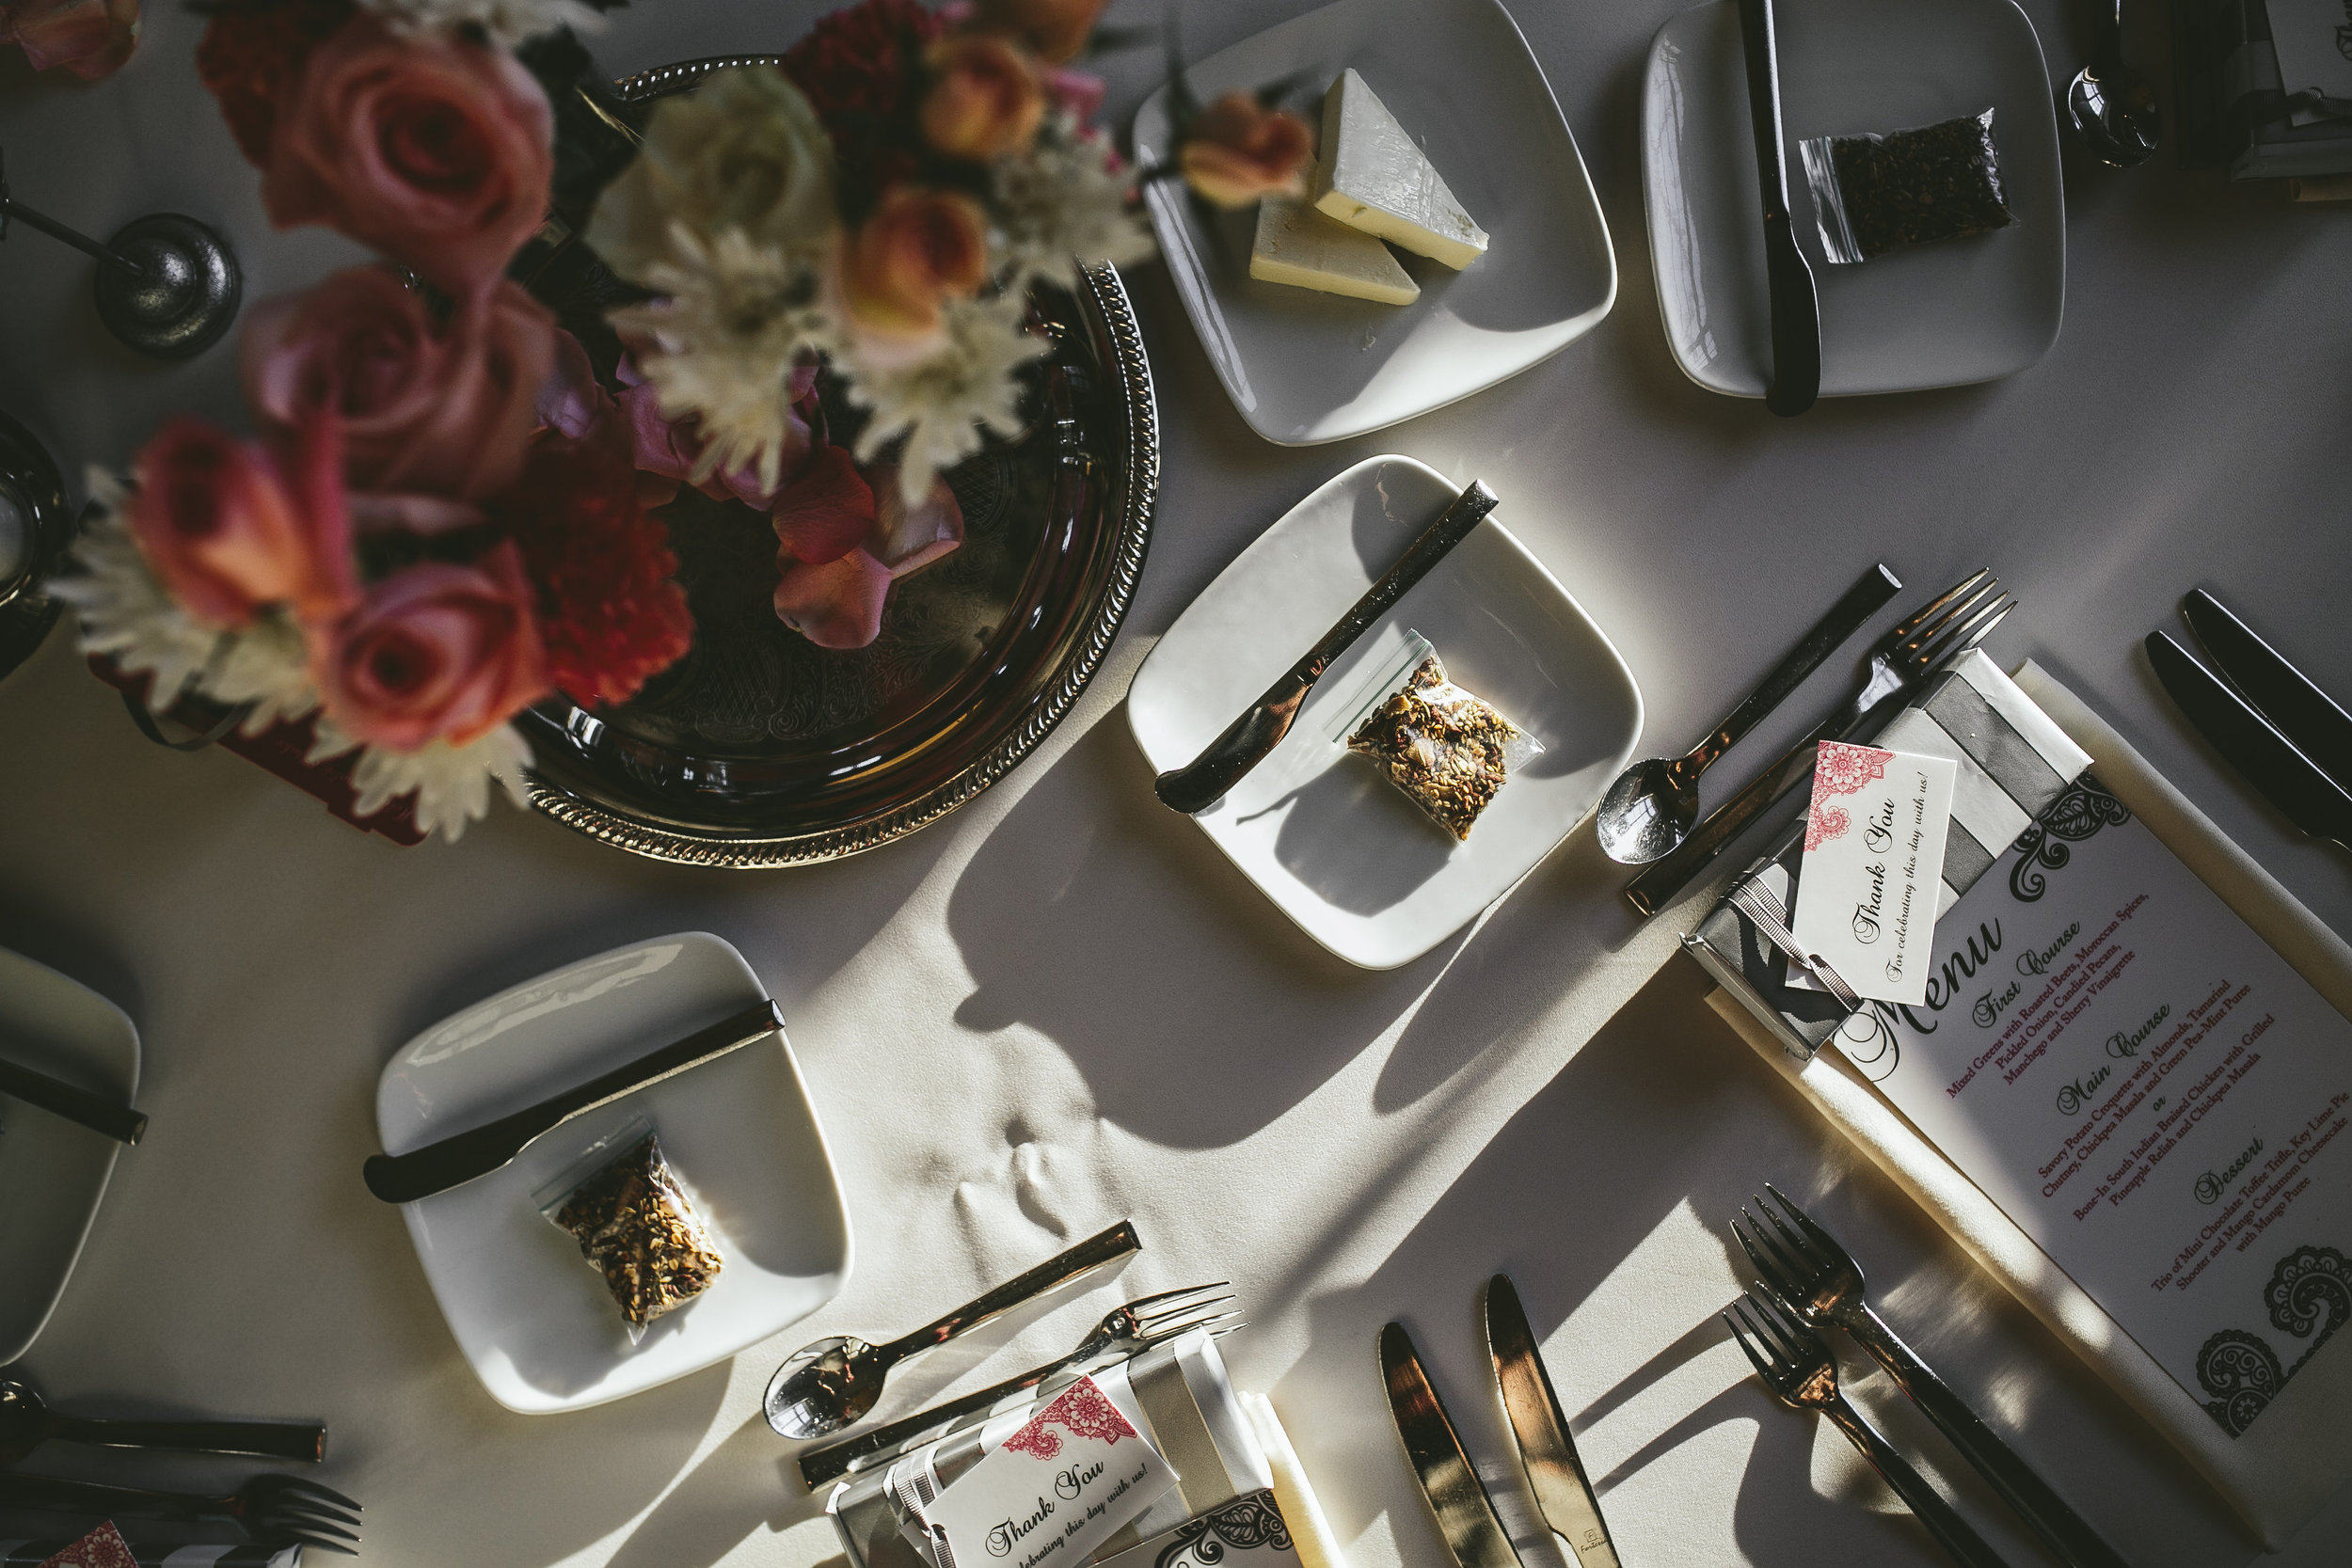 Acowsay_Minnesota_Wedding_Video_Tablescape.JPG